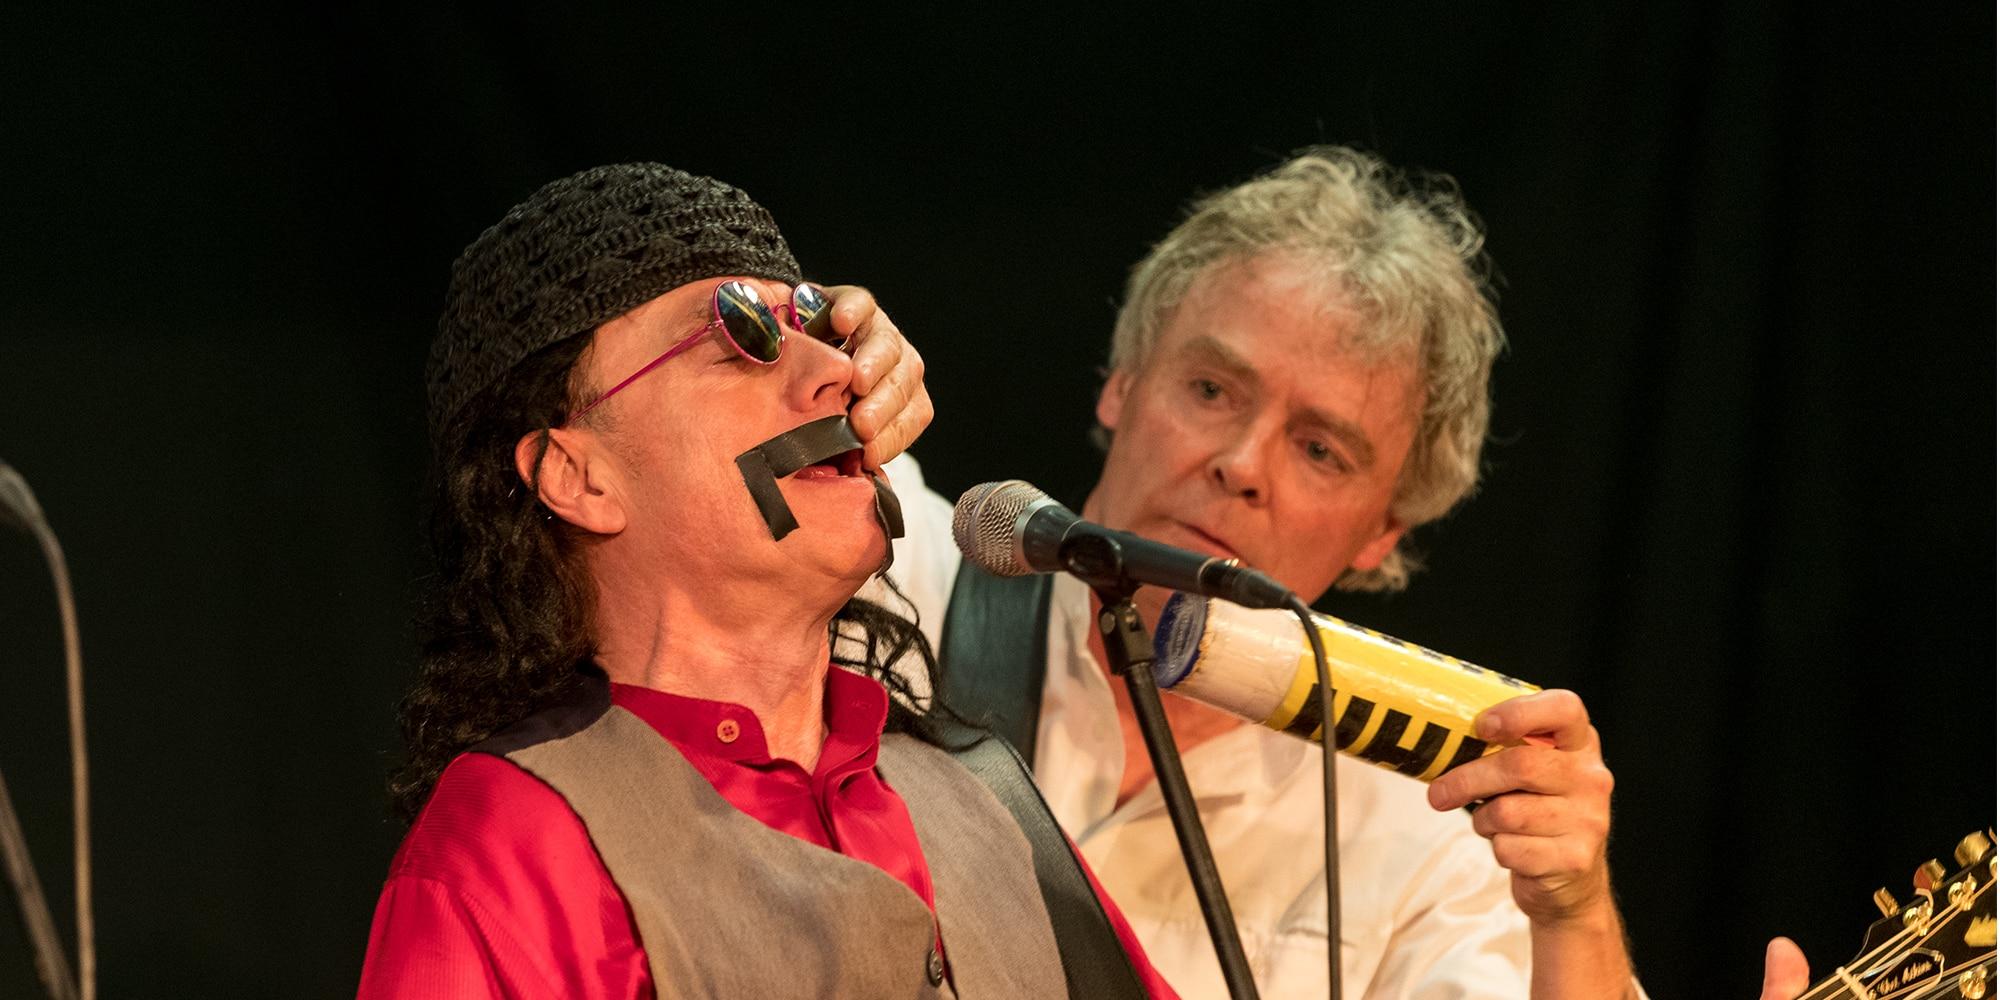 Mark'n'Simon Musik, Comedy - Frank Zappa Imitation